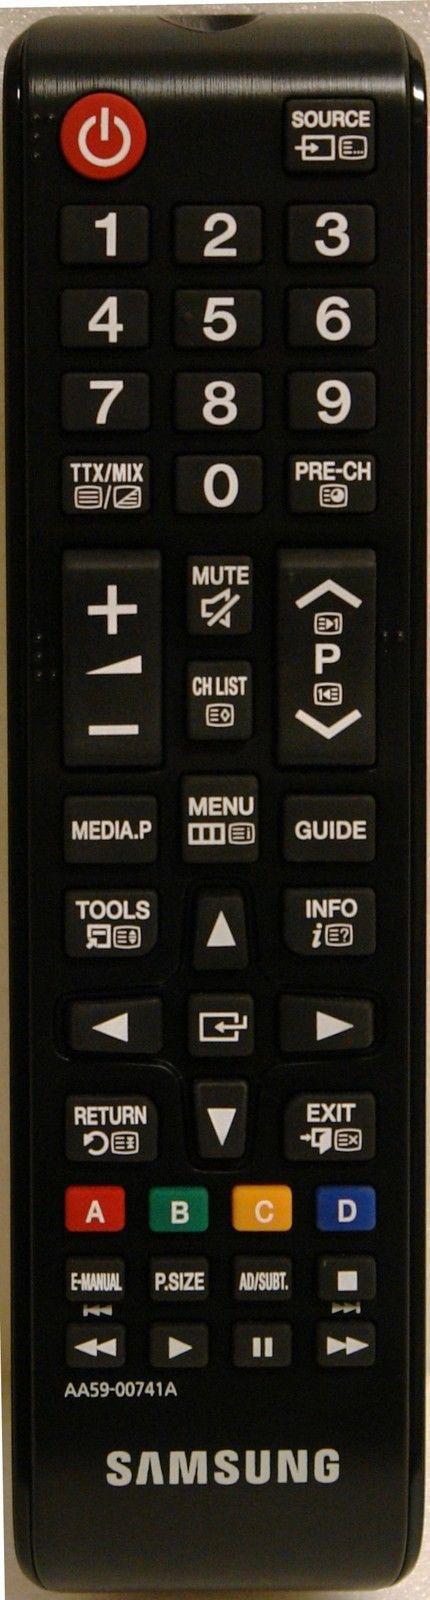 Pilot RTV Samsung TM1240 (AA59-00741A) 1